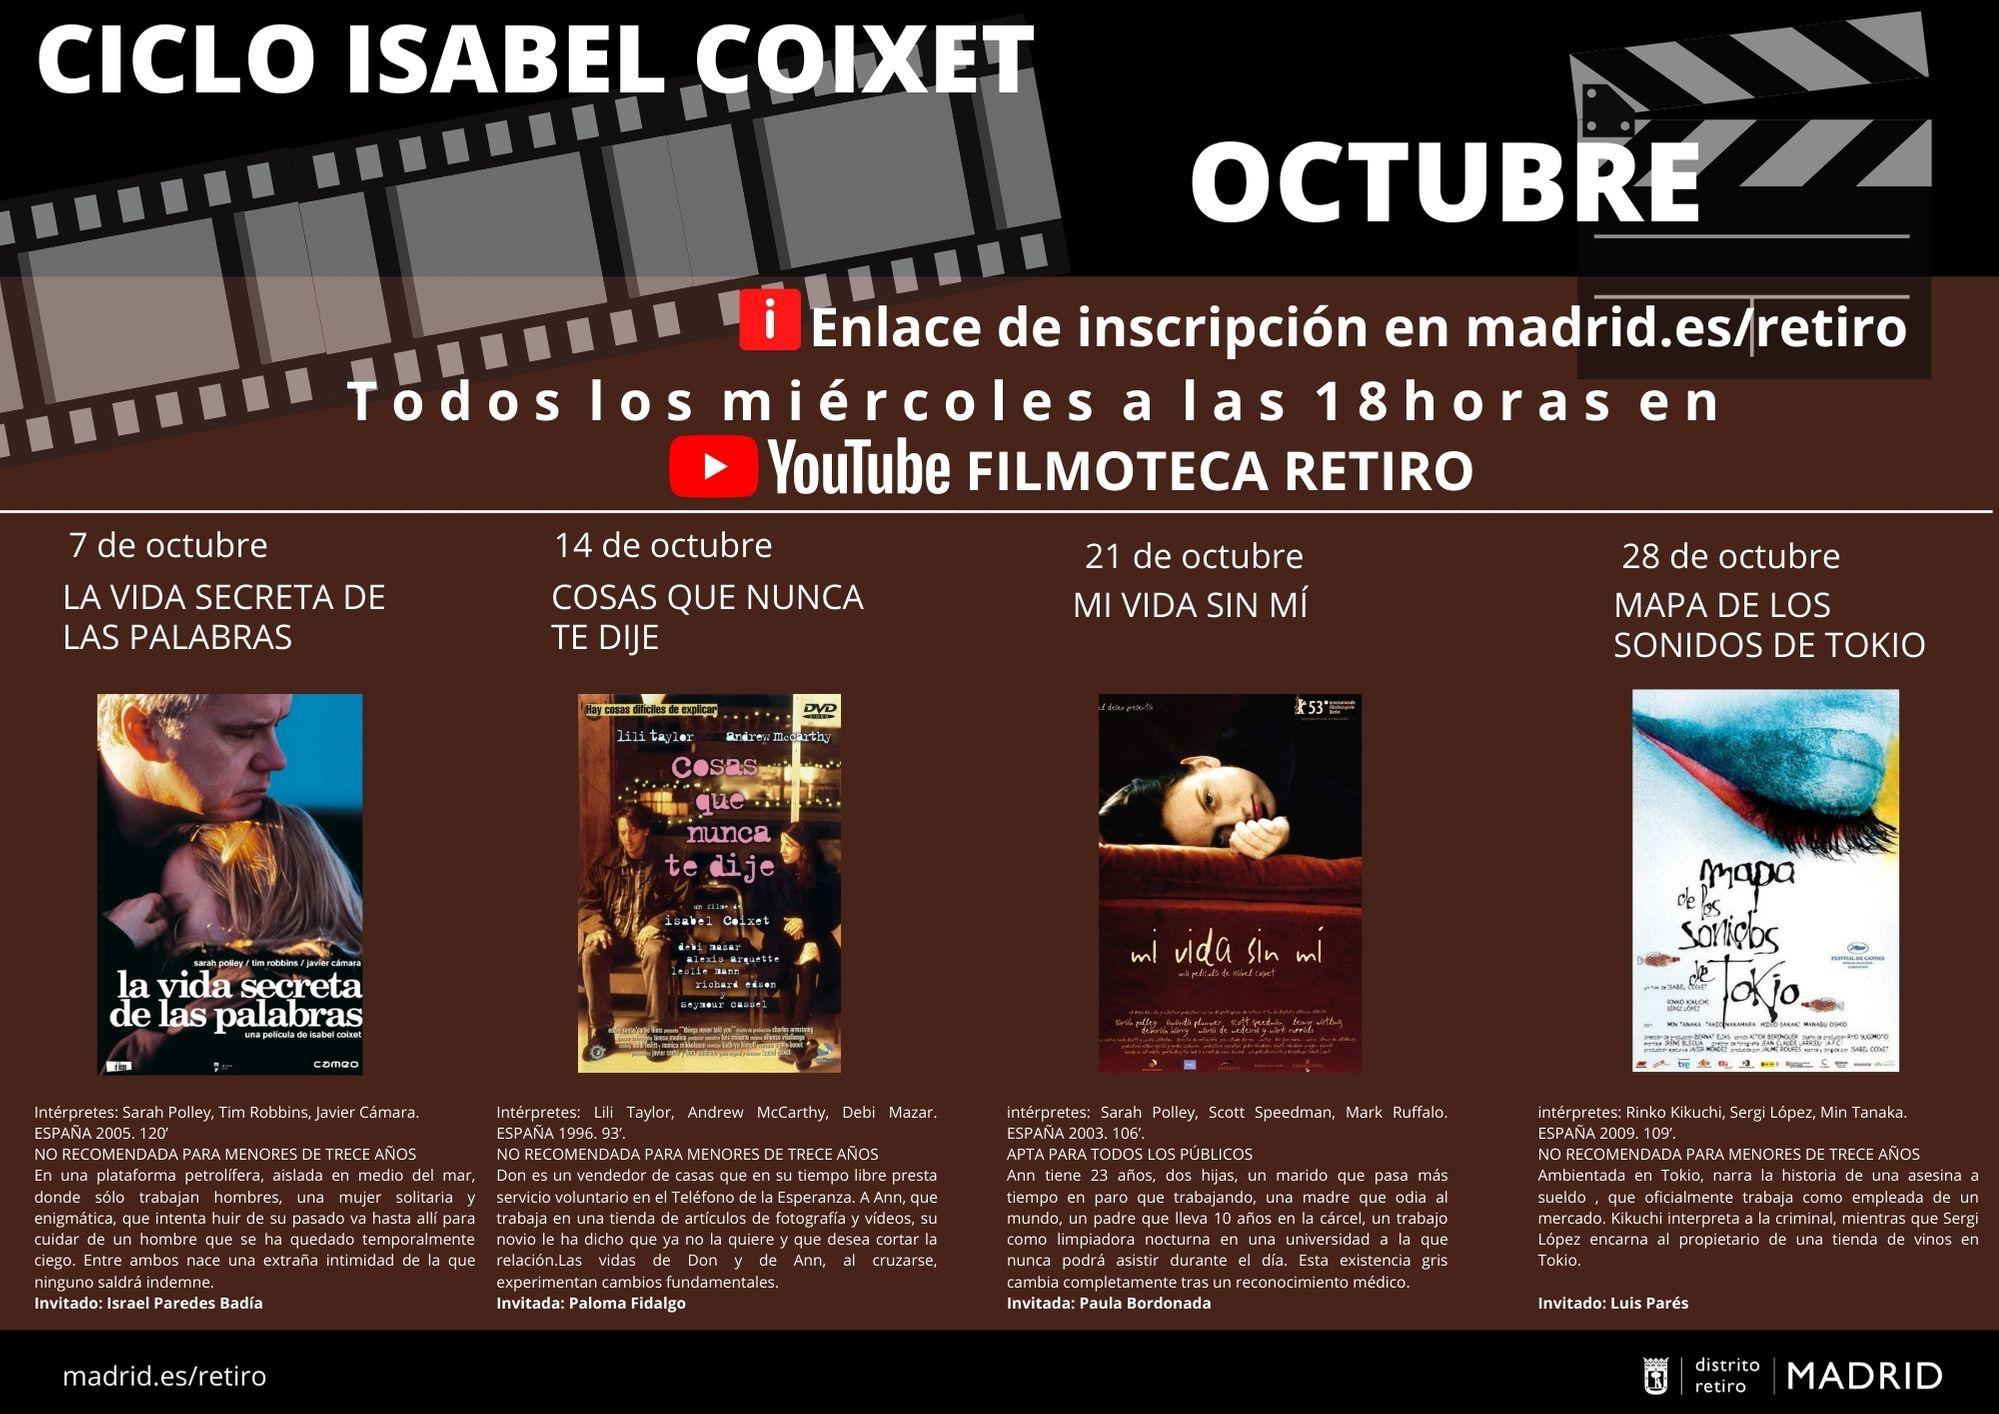 Filmoteca Retiro. Ciclo de cine dedicado a Isabel Coixet